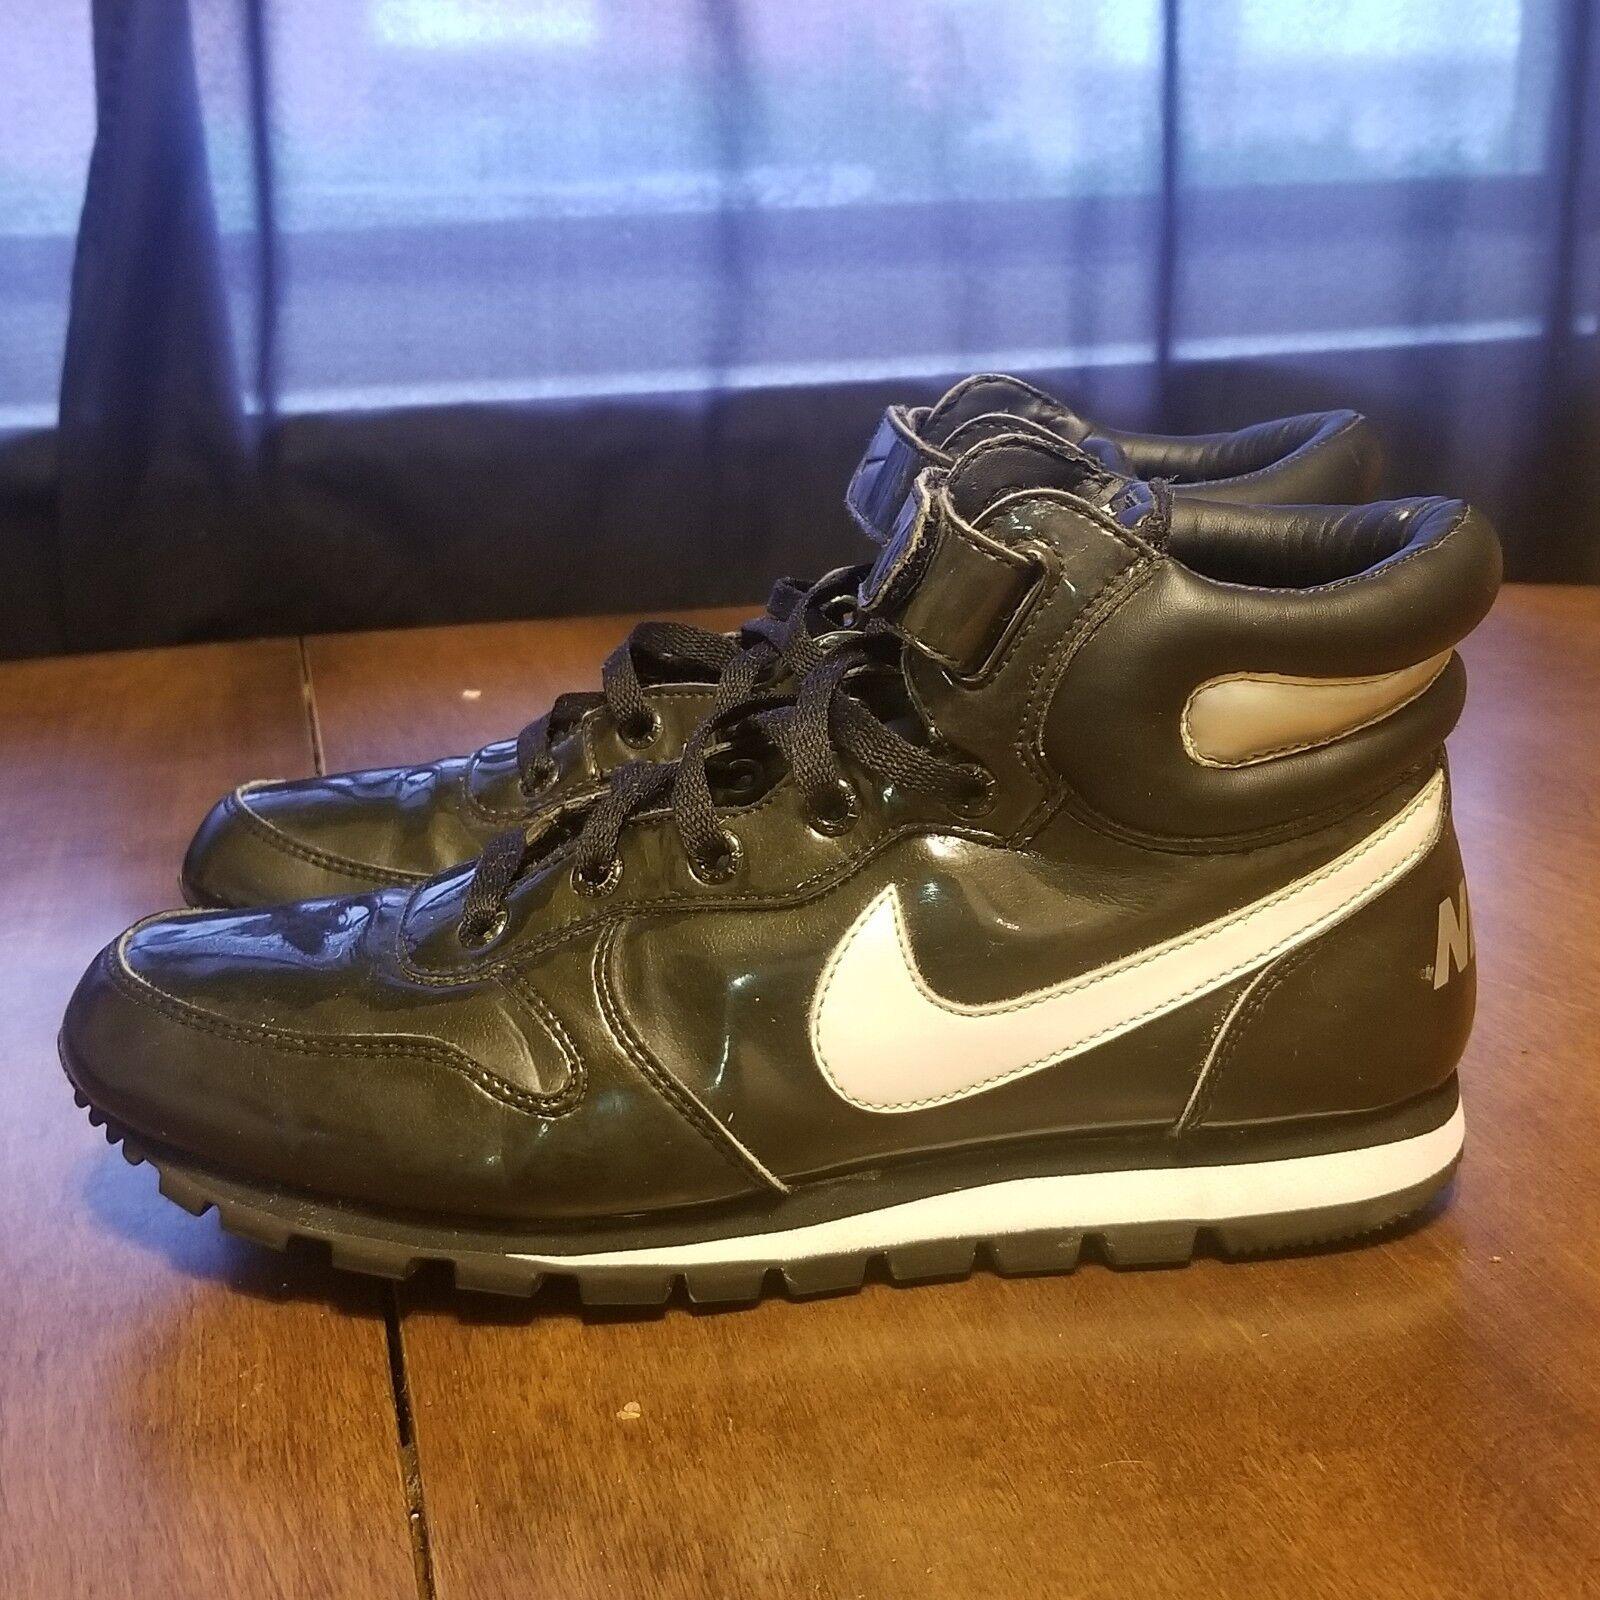 B37 Rare Nike Snow Trainer Plus Black Patent Leather Hi Top Strap Size 8.5